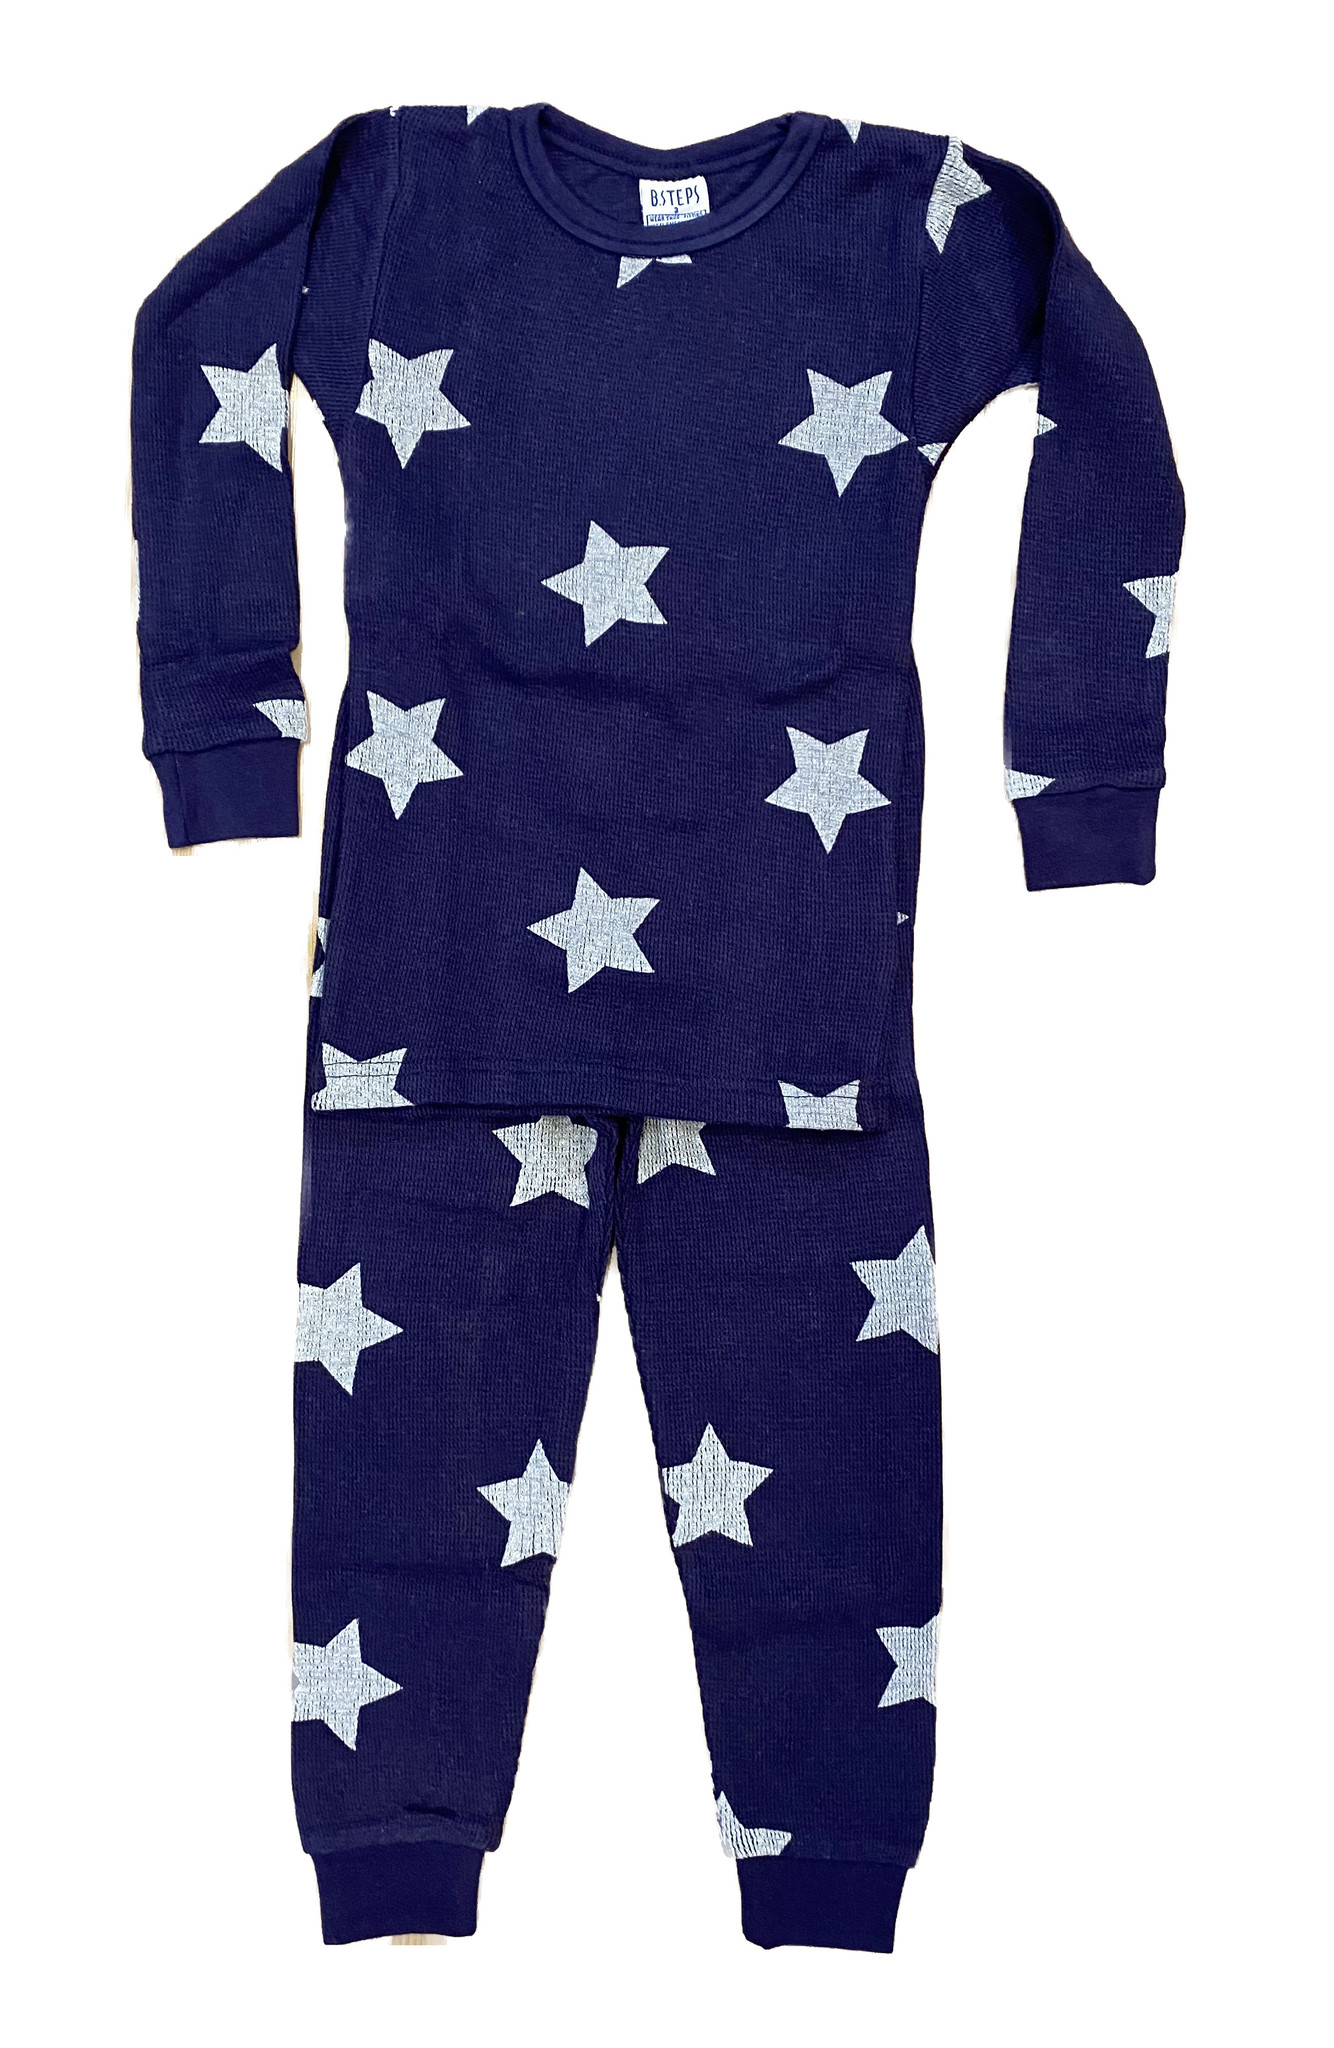 Baby Steps Navy Star Thermal PJ Set